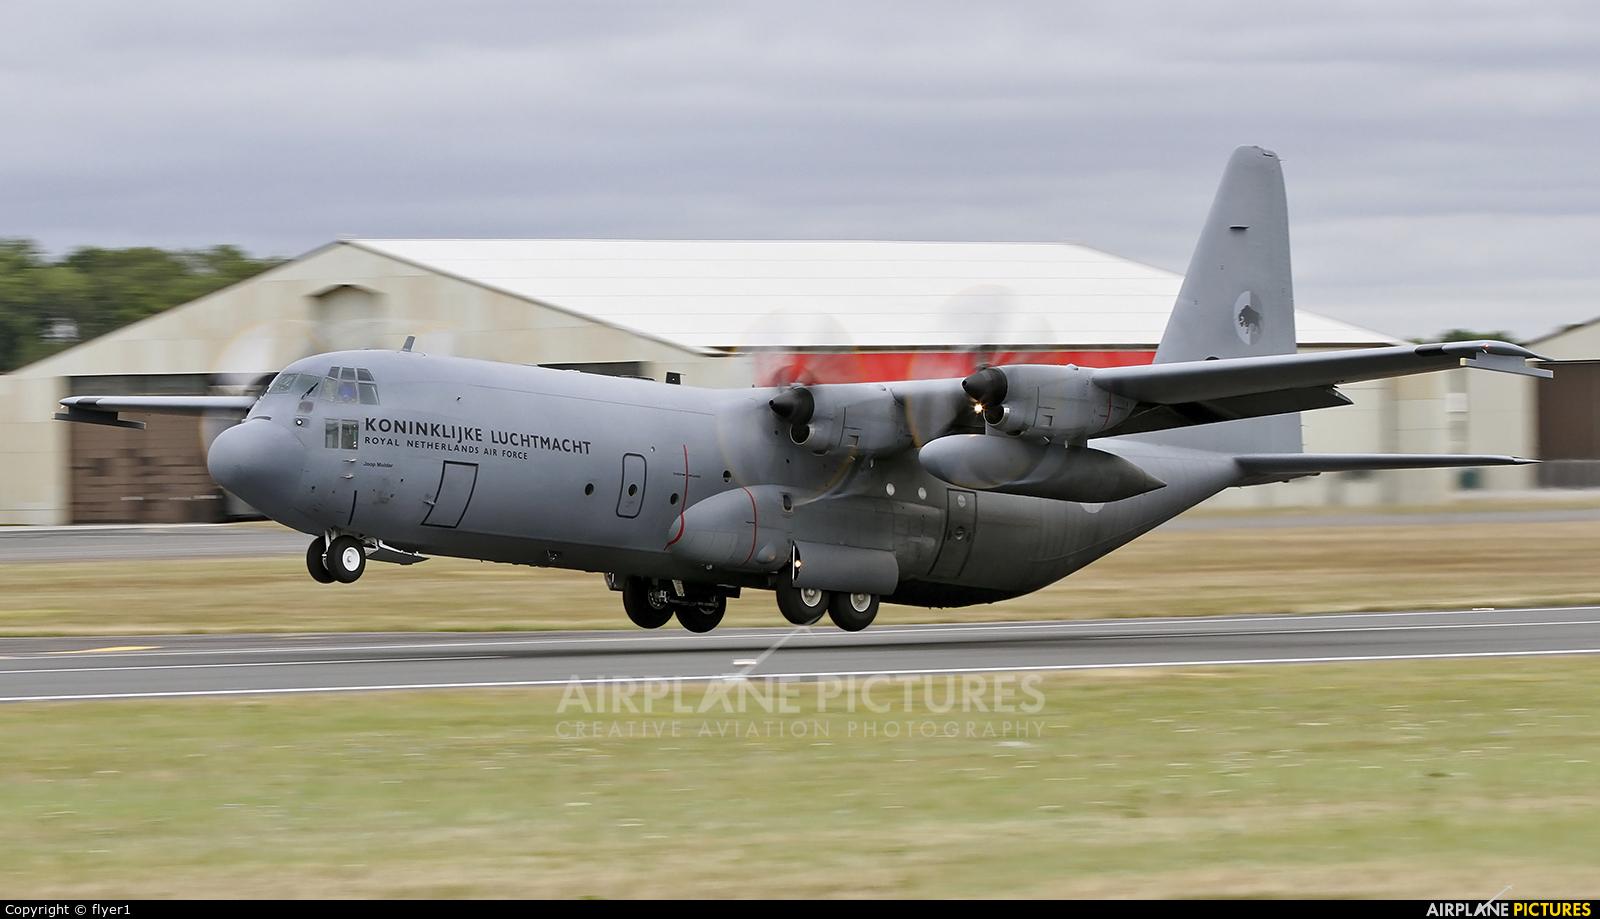 Netherlands - Air Force G-275 aircraft at Fairford